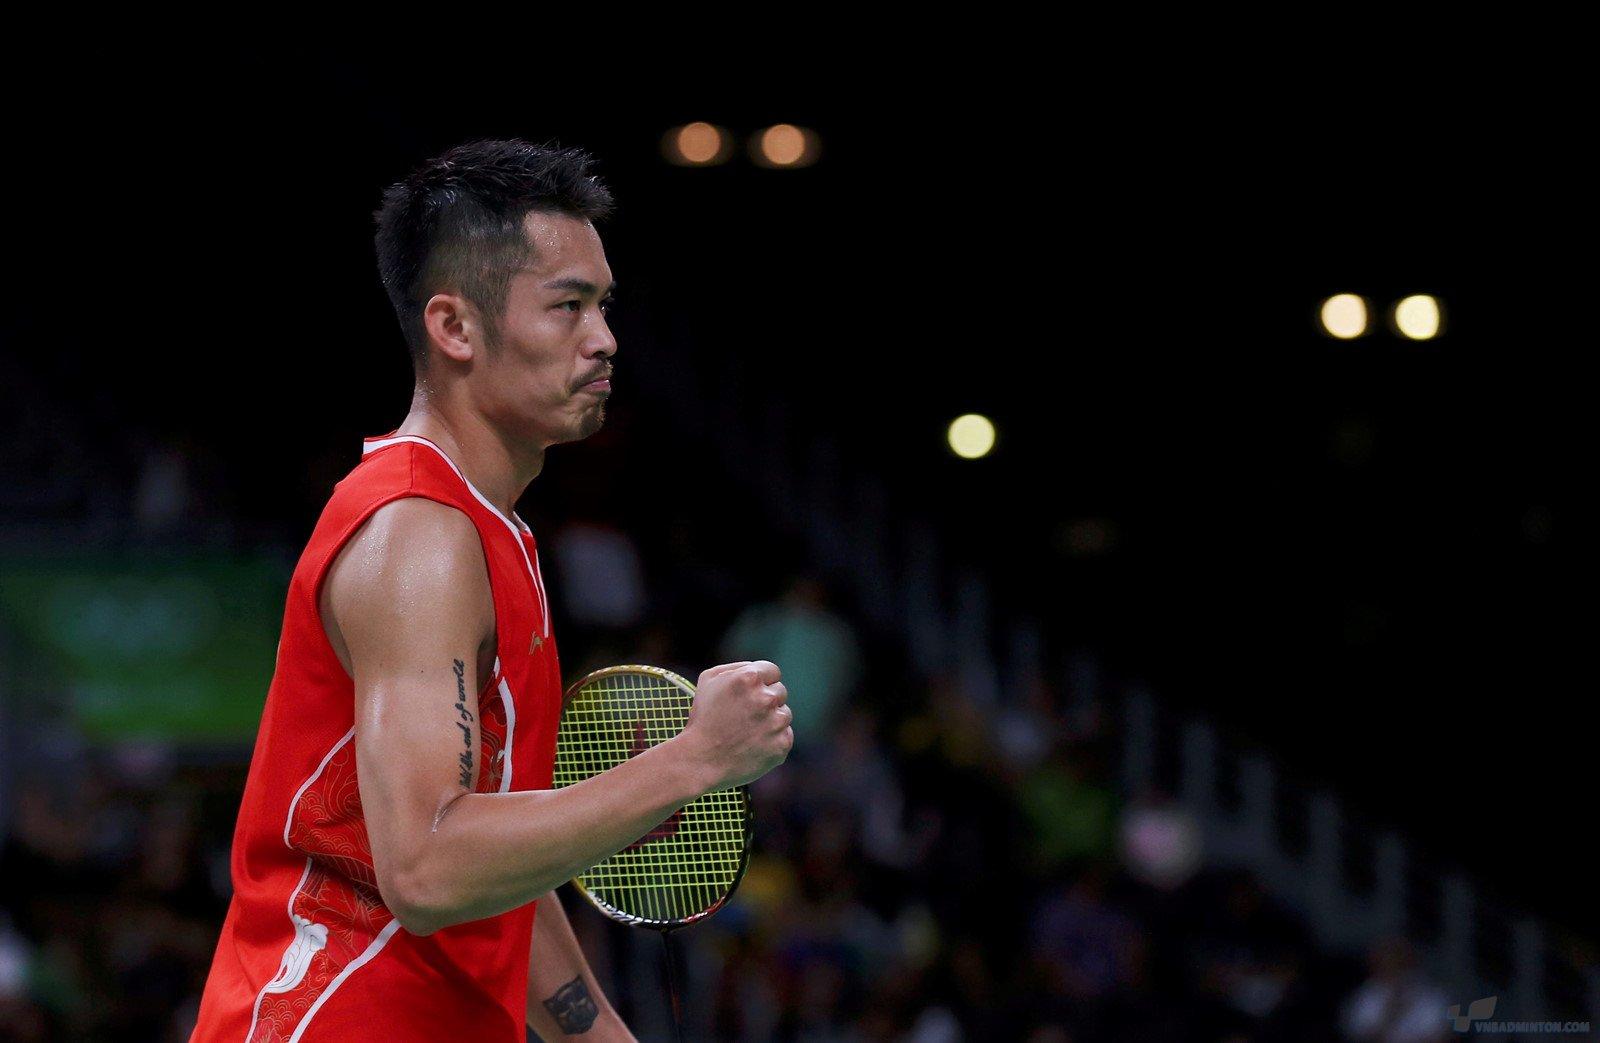 2016-08-14t134008z_1401693552_rioec8e11yv6w_rtrmadp_3_olympics-rio-badminton-m-singles_dnpz.jpg